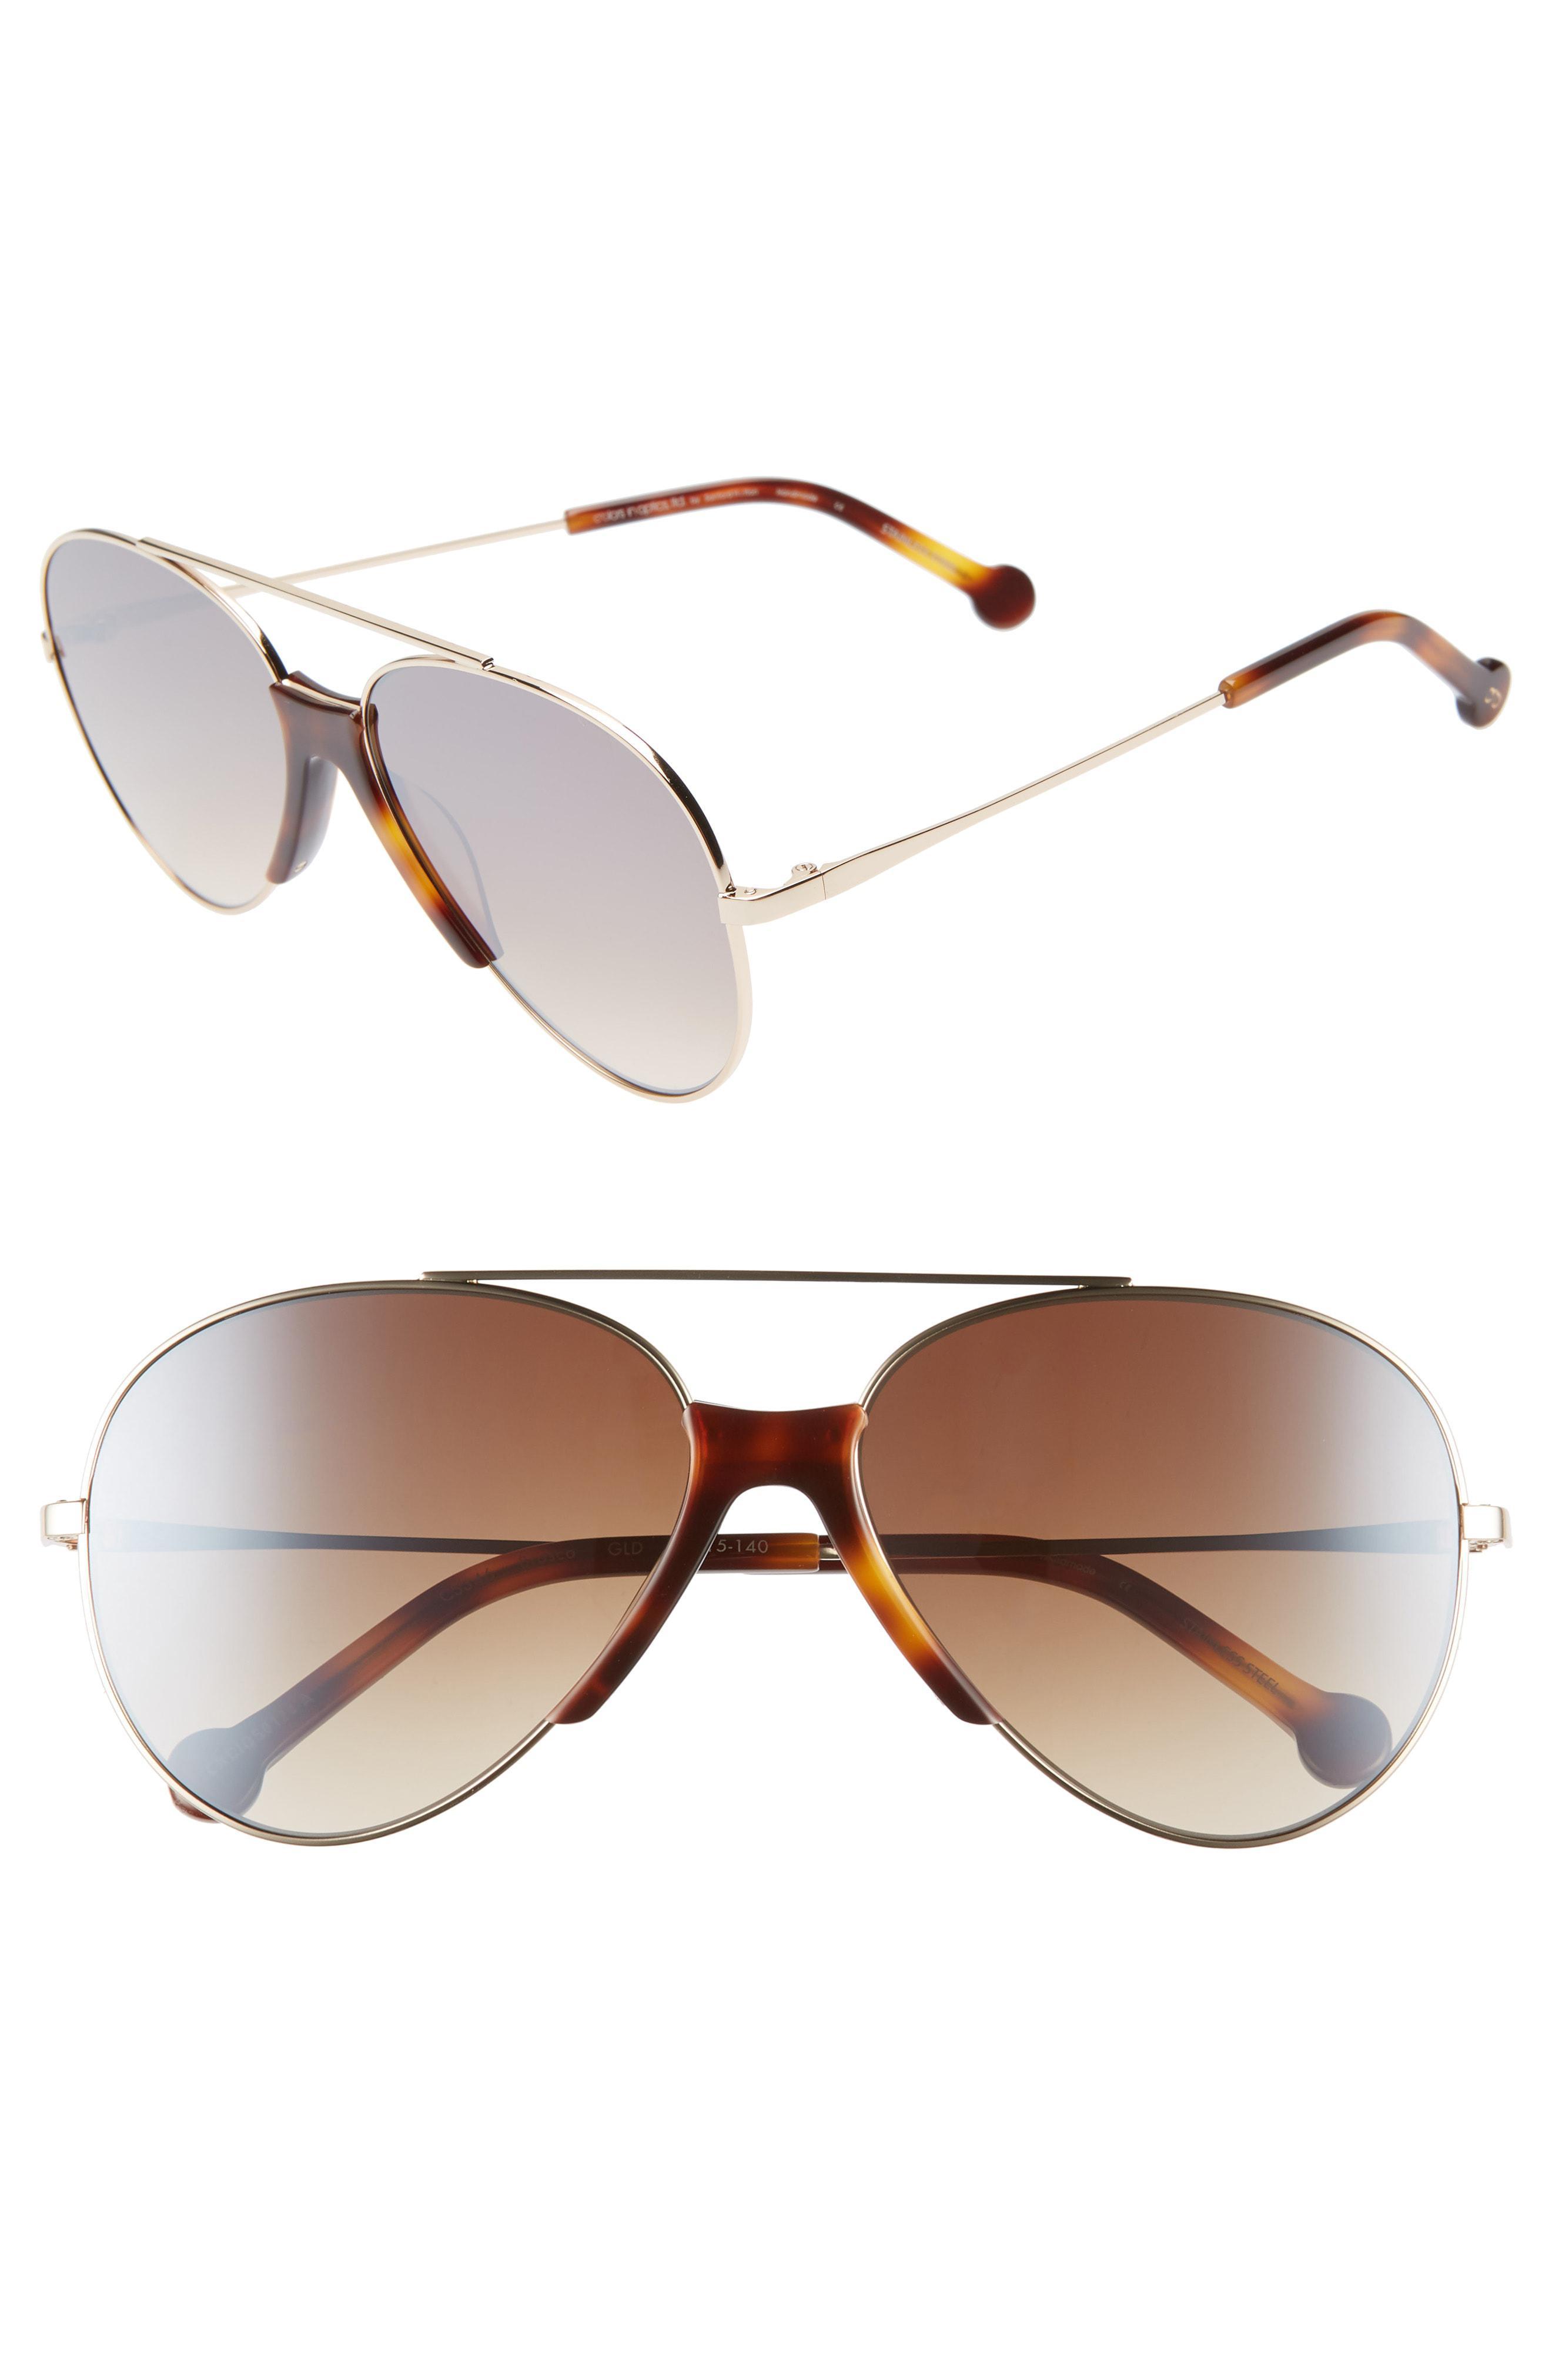 155adab6d5d Lyst - Colors In Optics Brasco 61mm Gradient Aviator Sunglasses in Brown